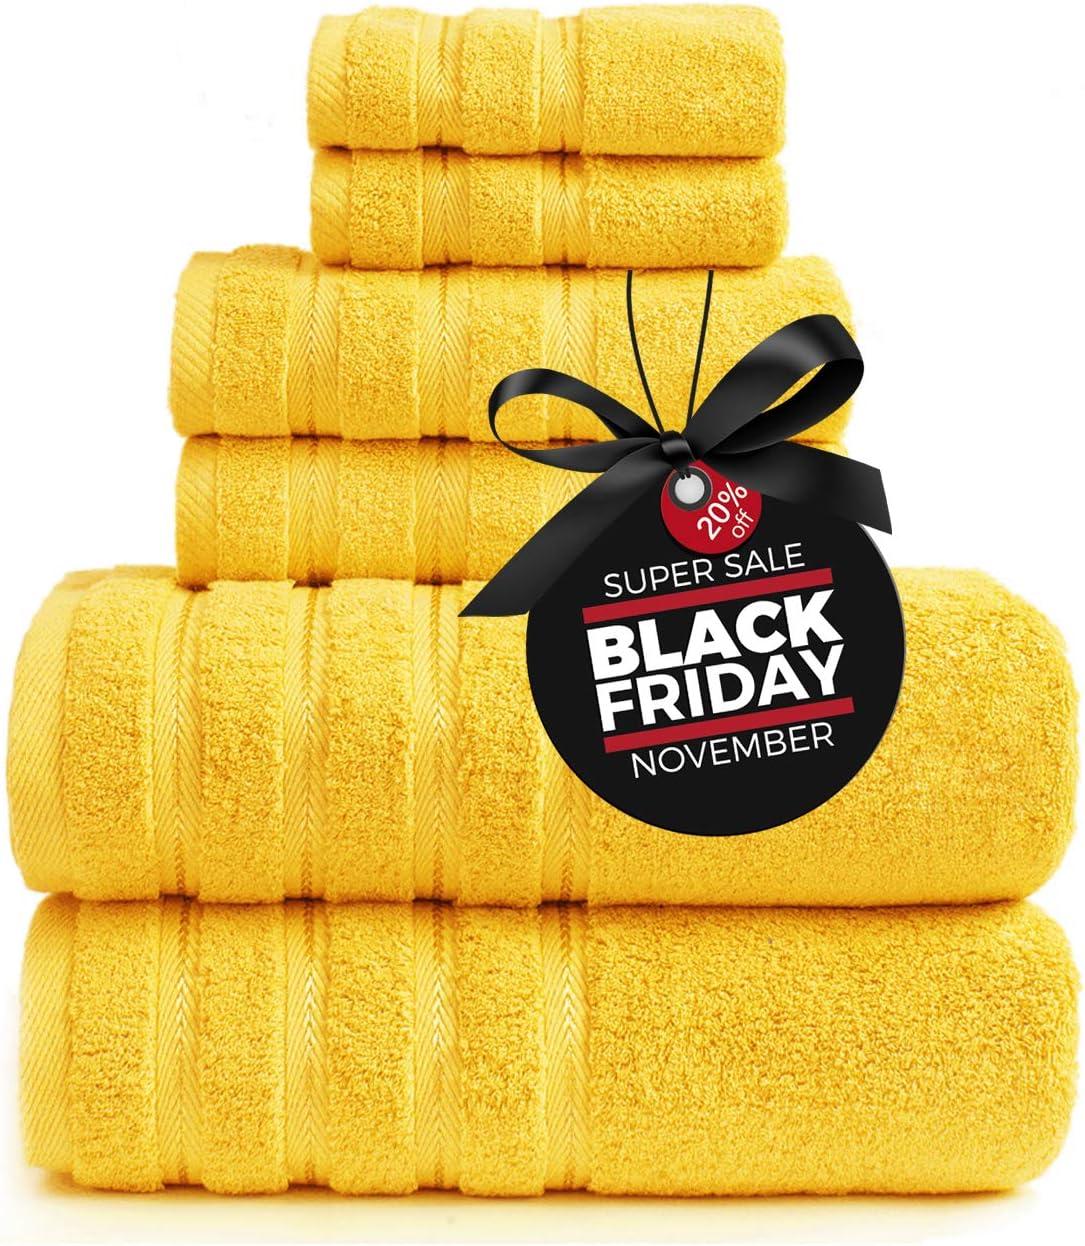 Sofi Towel 6 Piece Towel Set, Premium Luxury Hotel & Spa Quality, 100% Turkish Cotton Bathroom Towels, Super Soft, Highly Absorbent, 2 Bath Towels, 2 Hand Towels, 2 Washcloths,Yellow